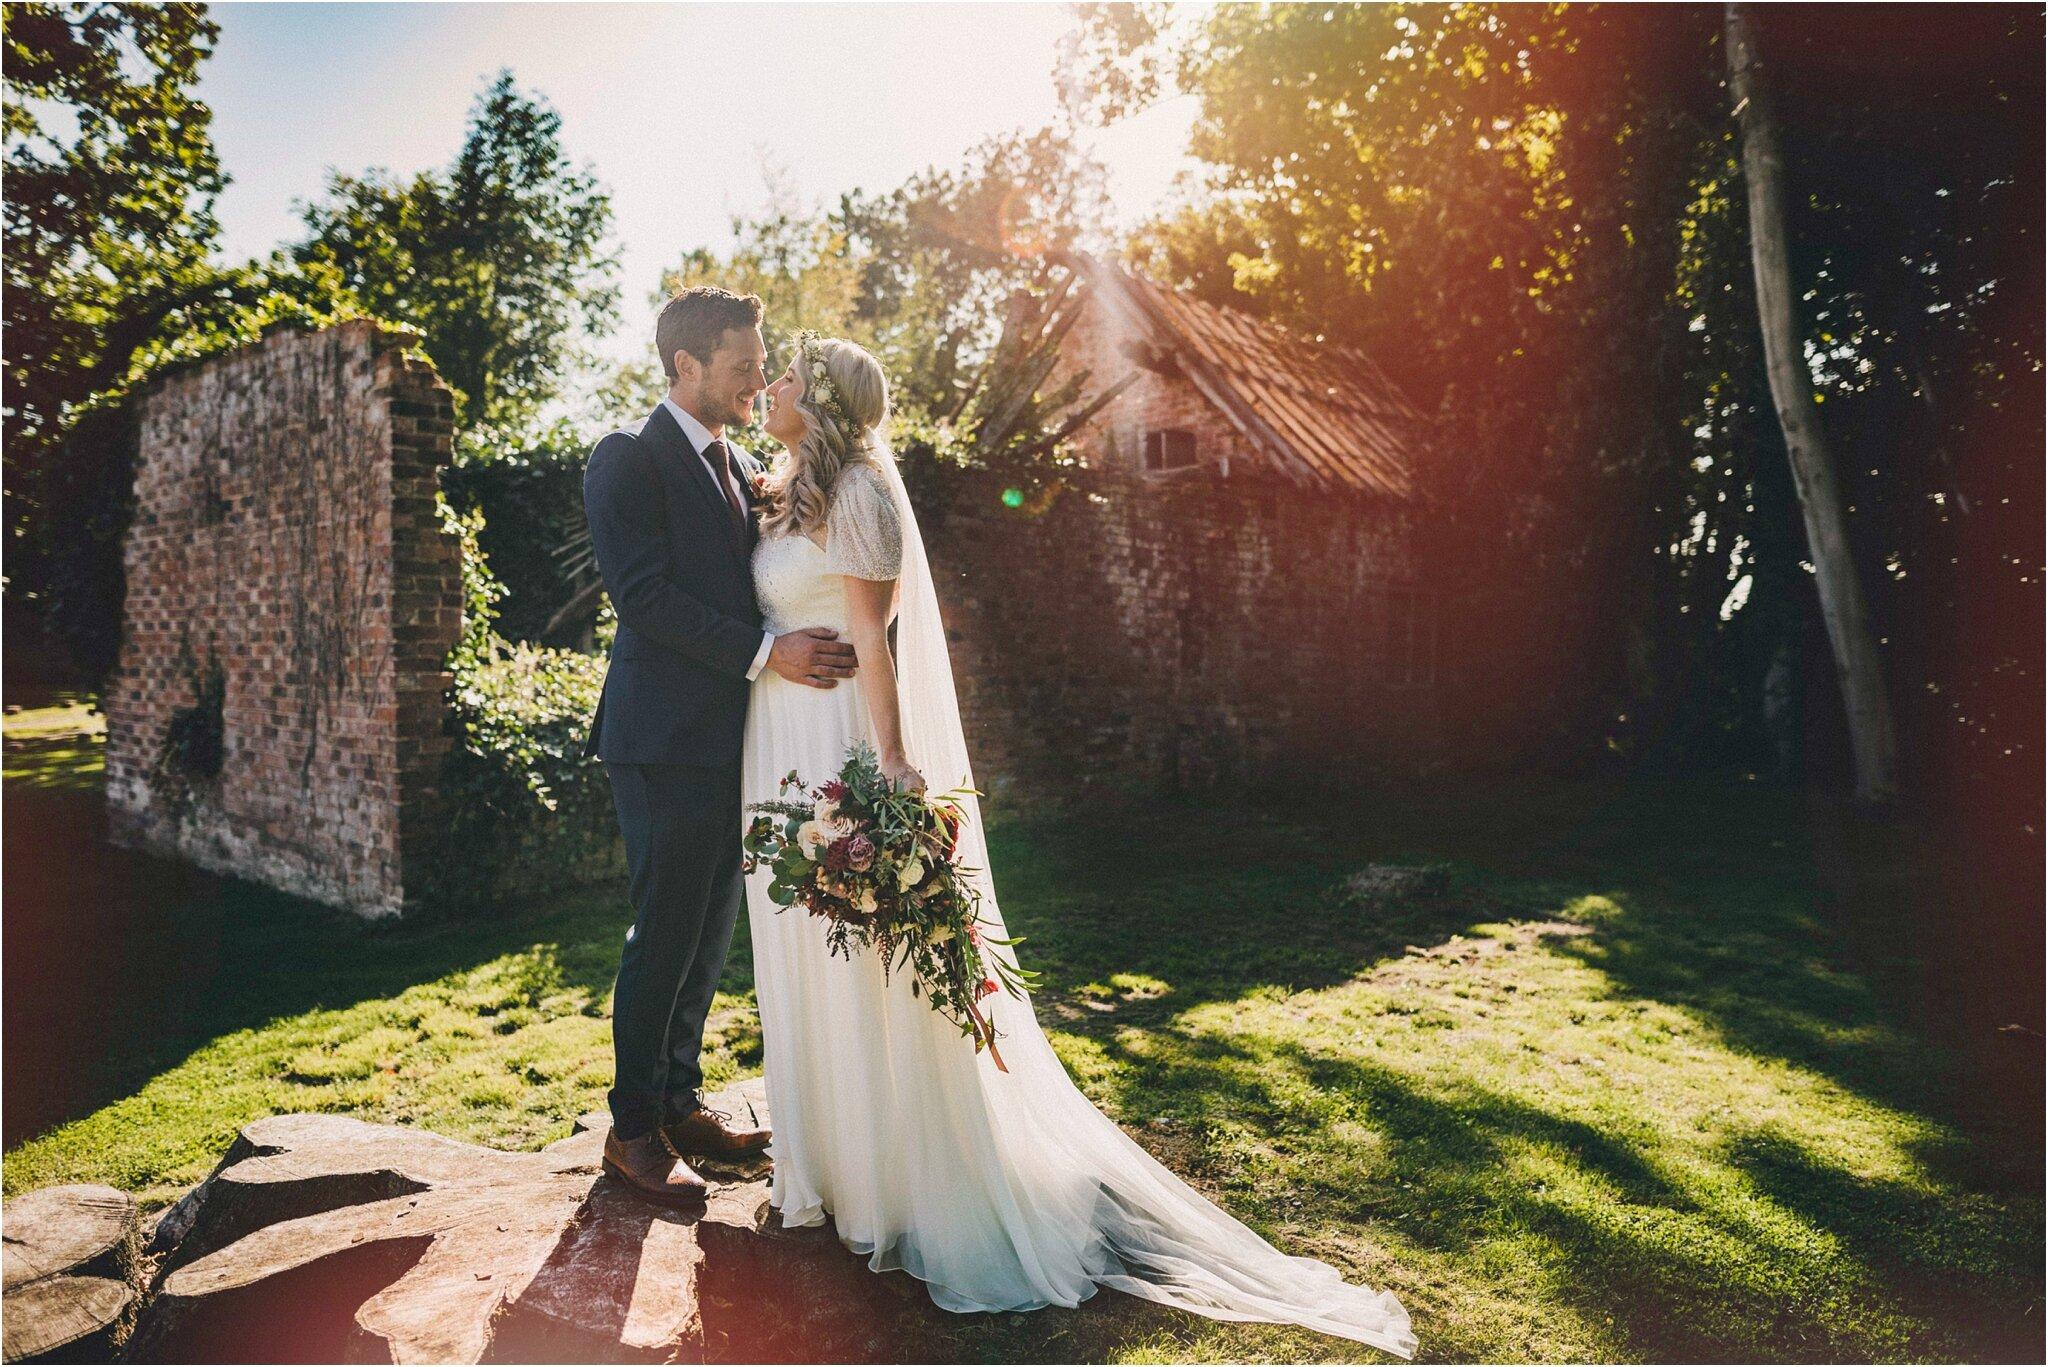 Dorfold Hall marquee wedding 00026.jpg